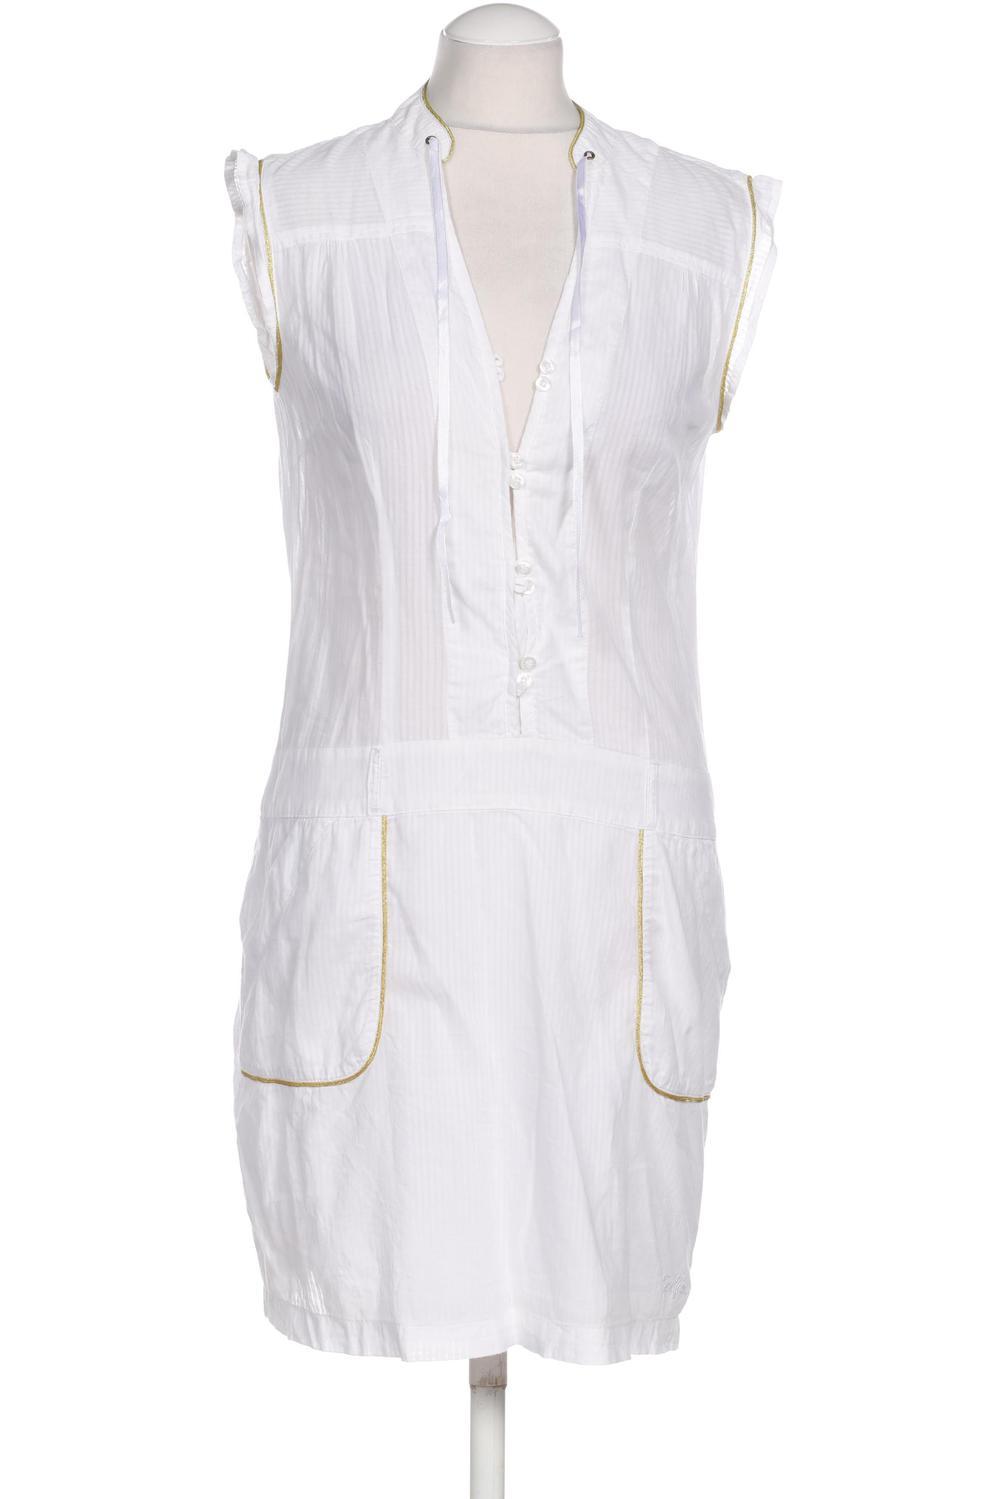 details zu pepe jeans kleid damen dress damenkleid gr. m baumwolle, viskose  weiß #3b8f561